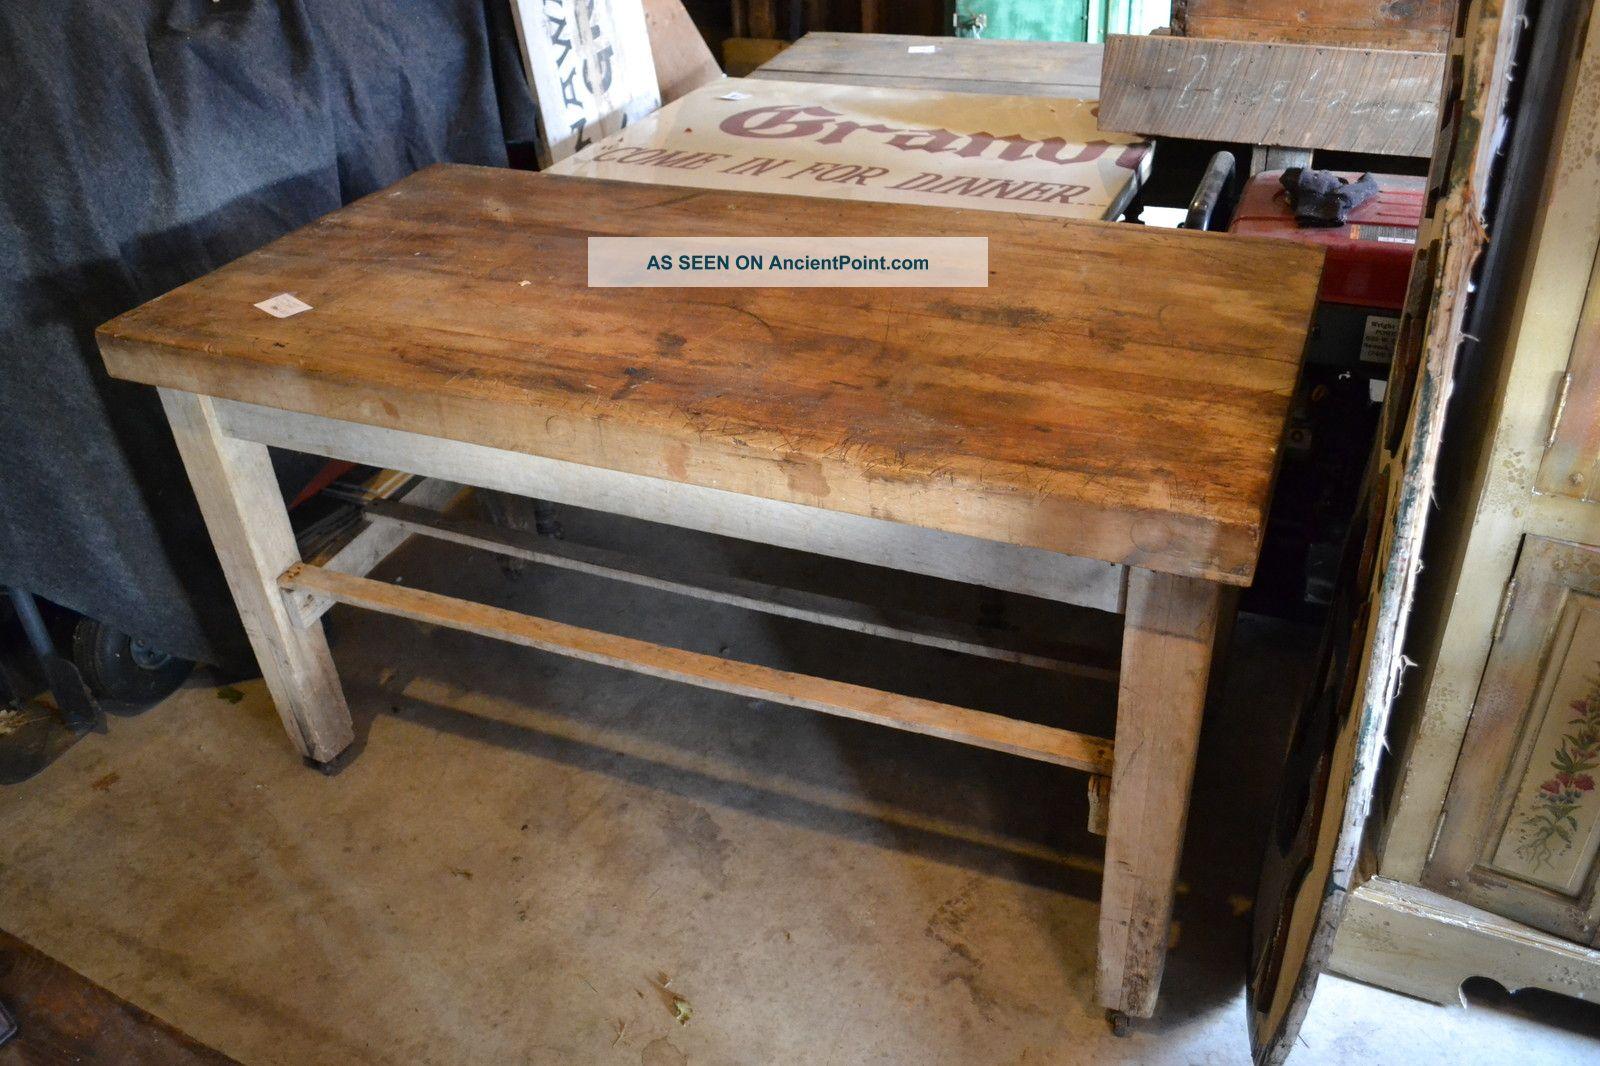 Vintage Butcher Block Table Wood Frame On Casters Workbench Kitchen Island